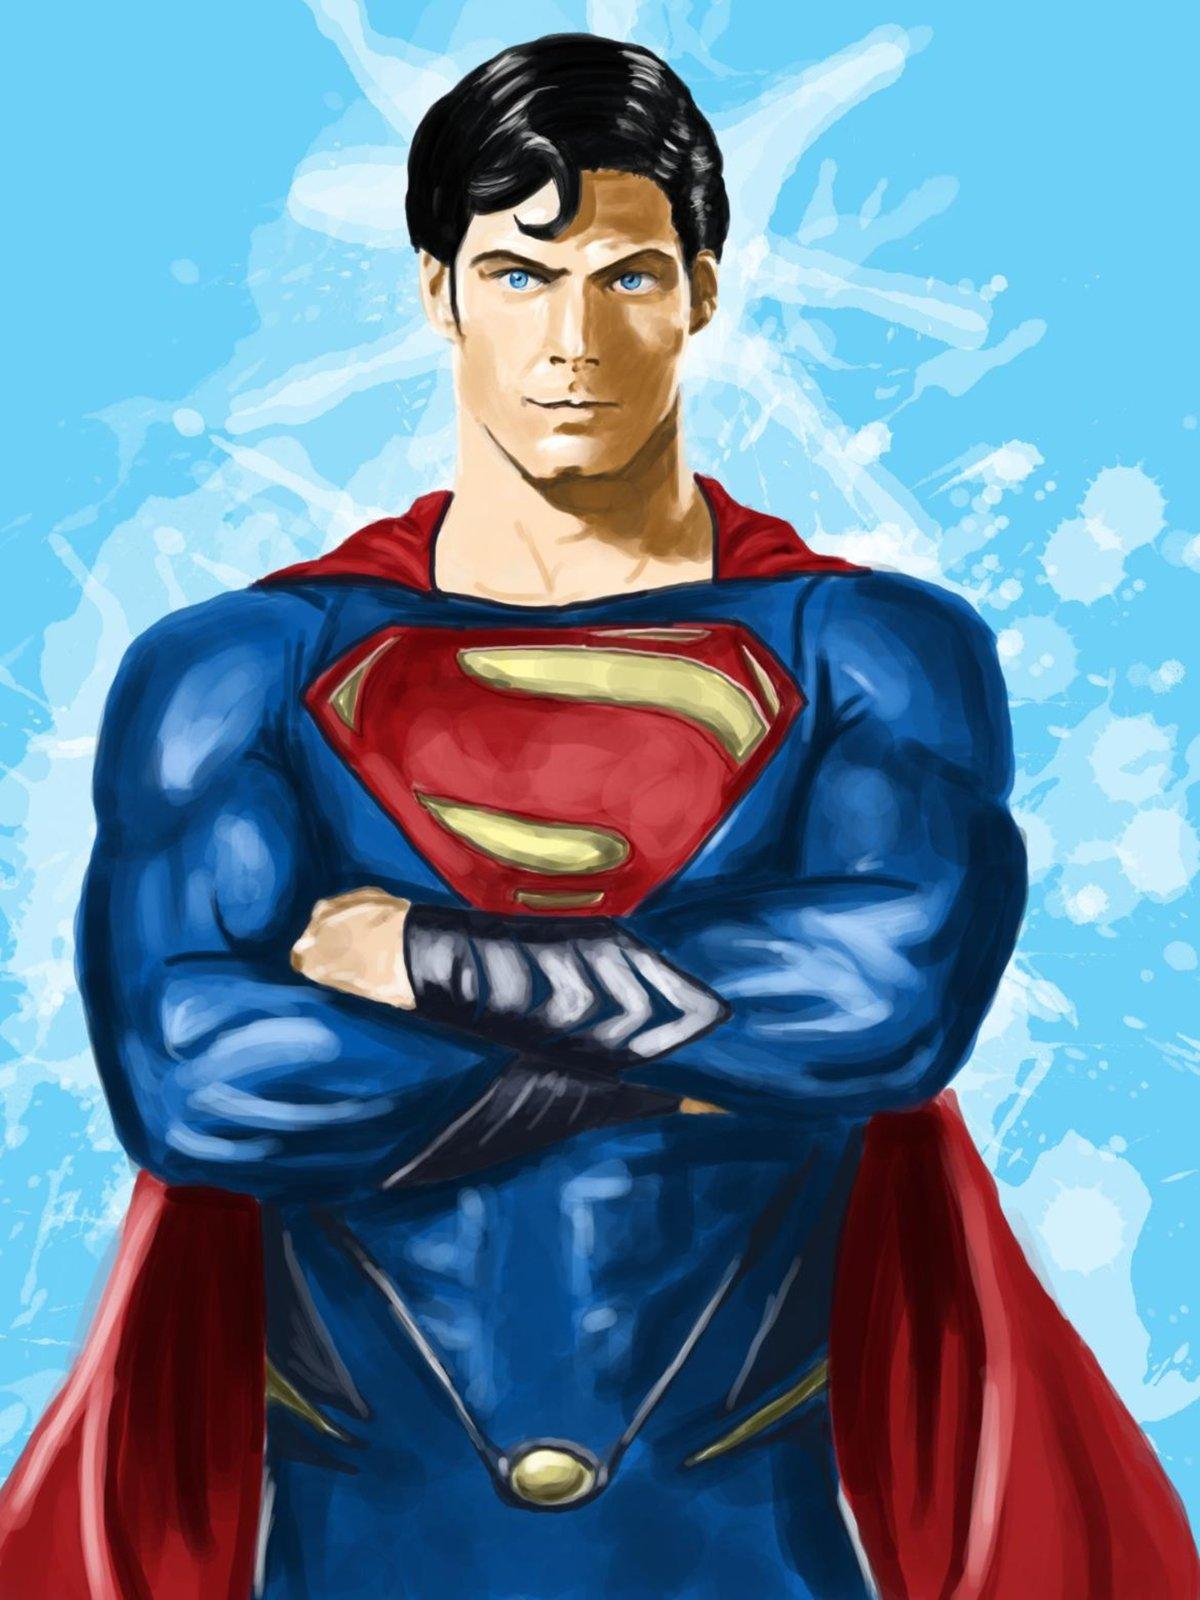 Giochi gratis superman